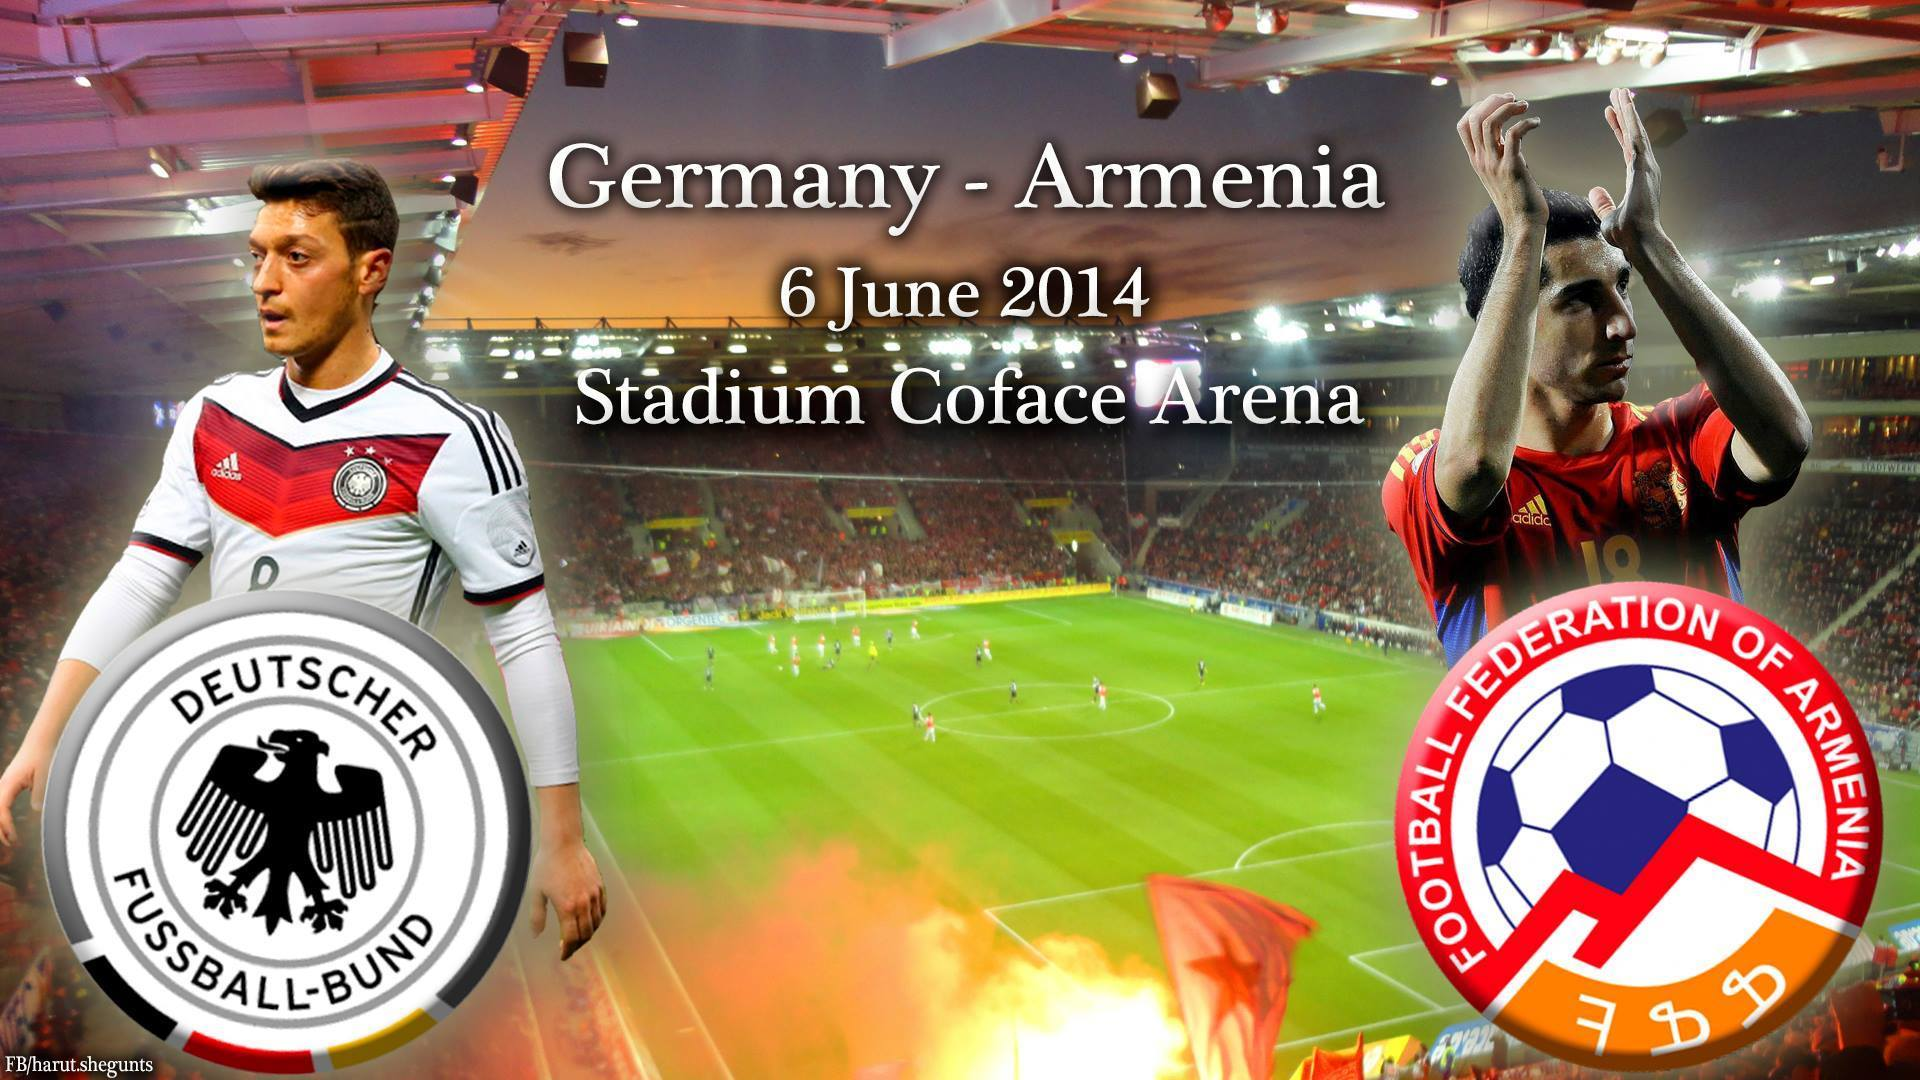 Germany-Armenia